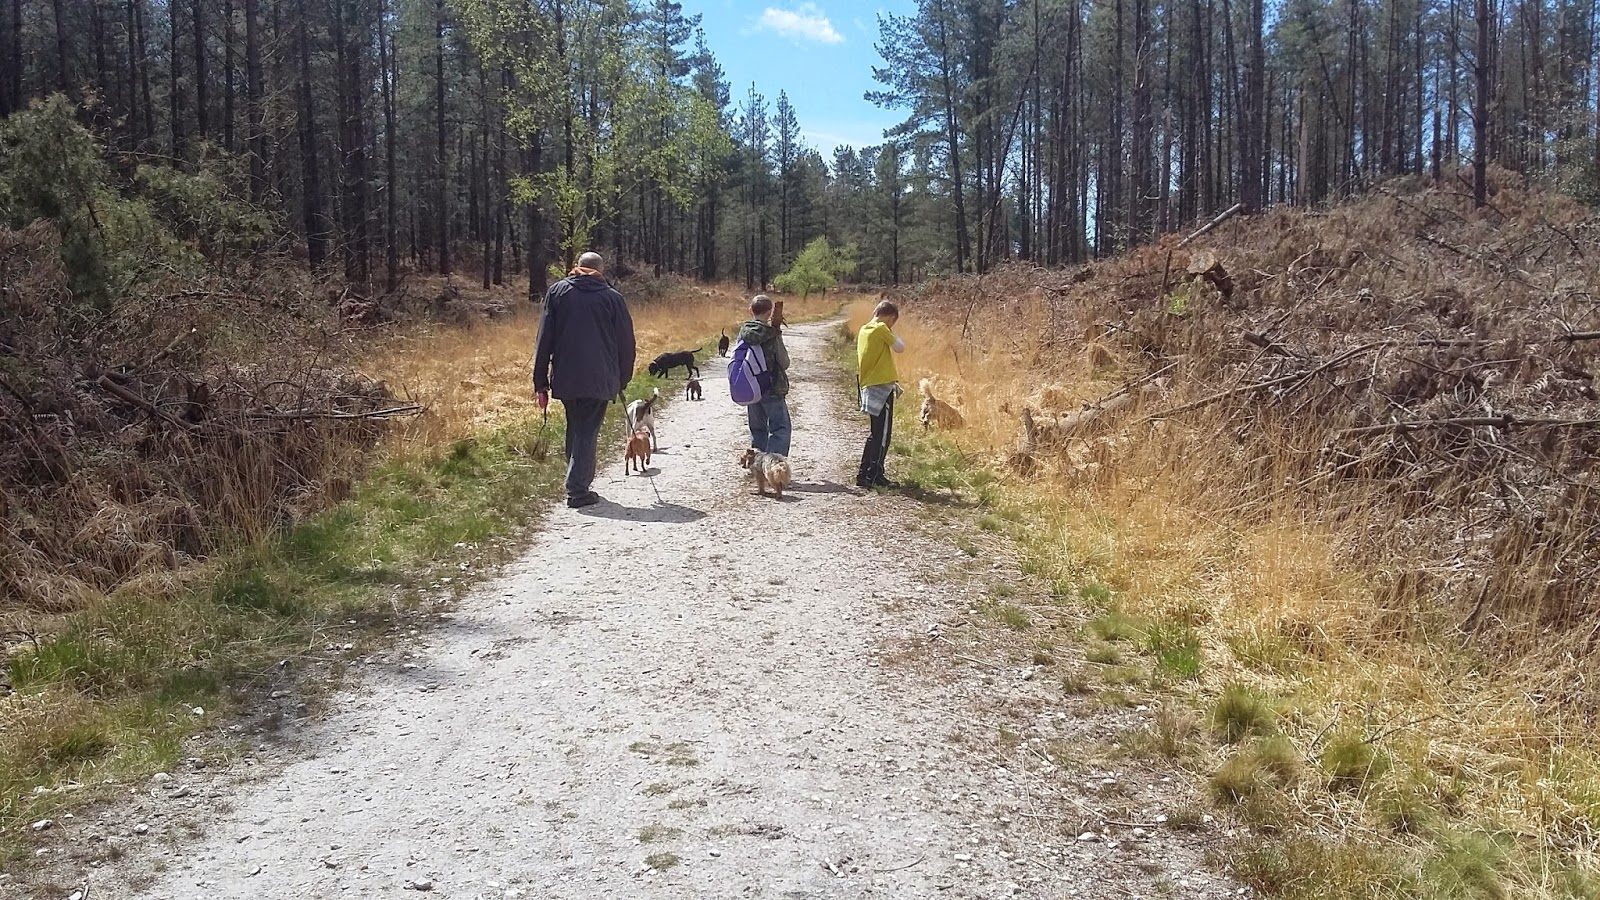 Wareham Forest Dog Walks